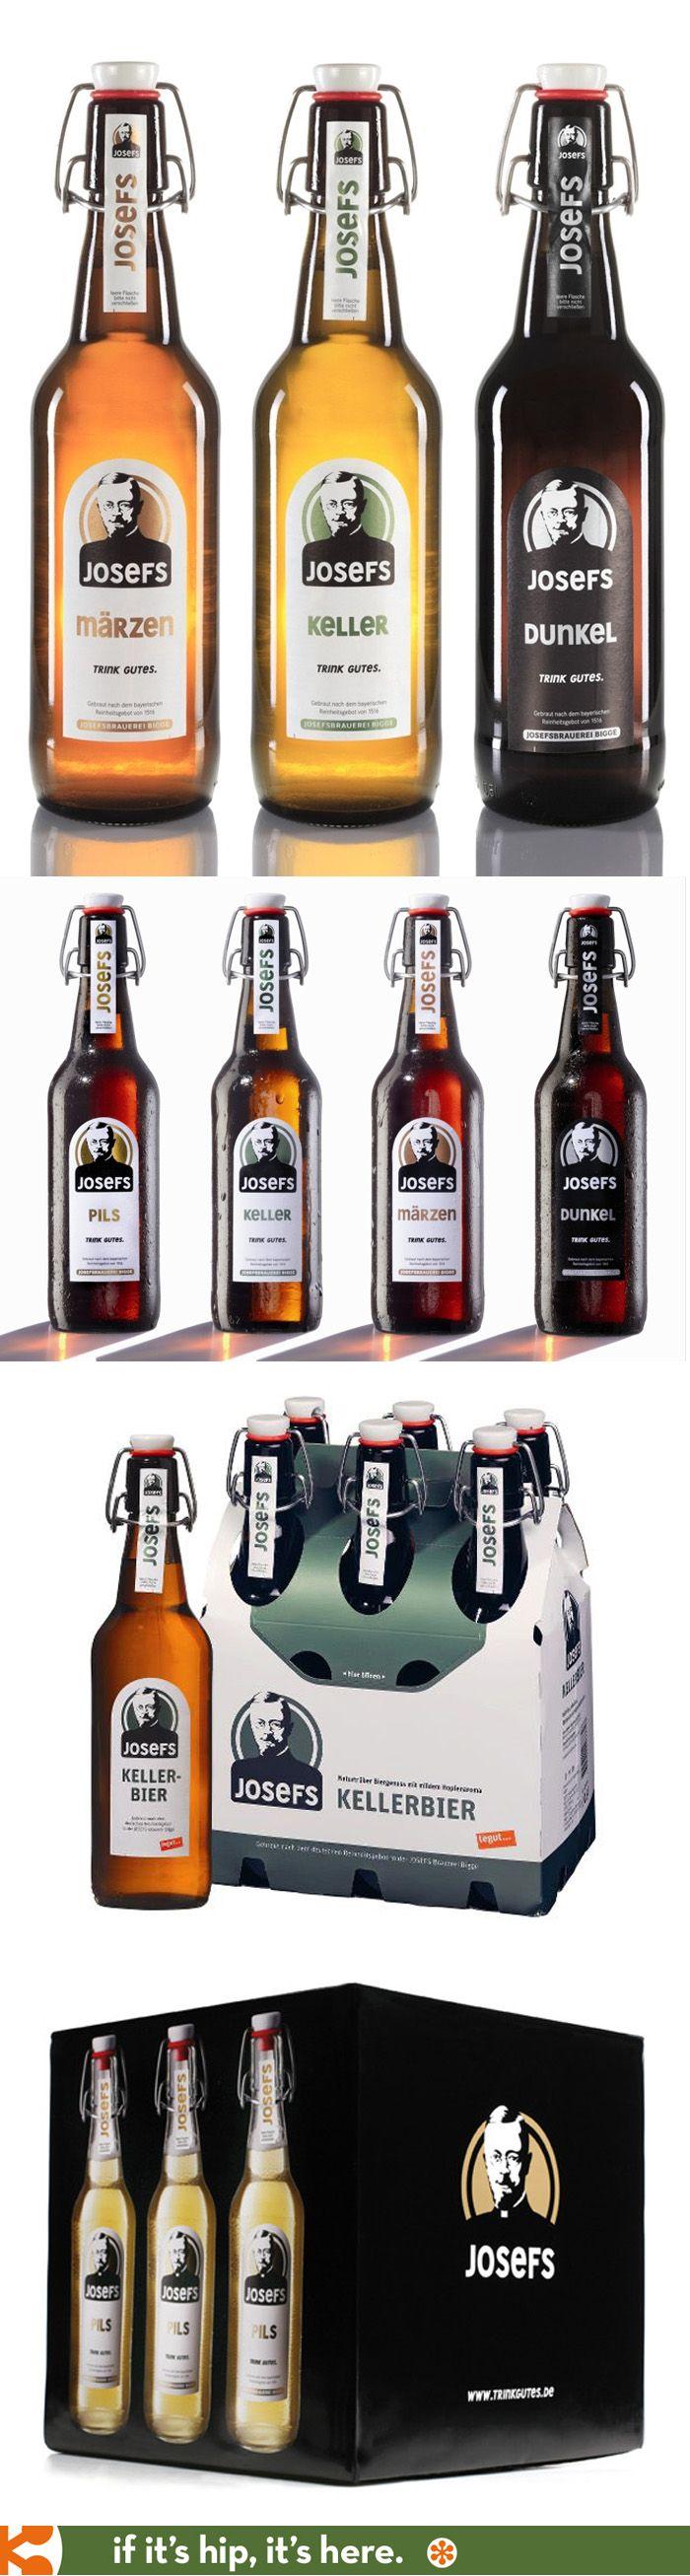 Josefs Beer packaging